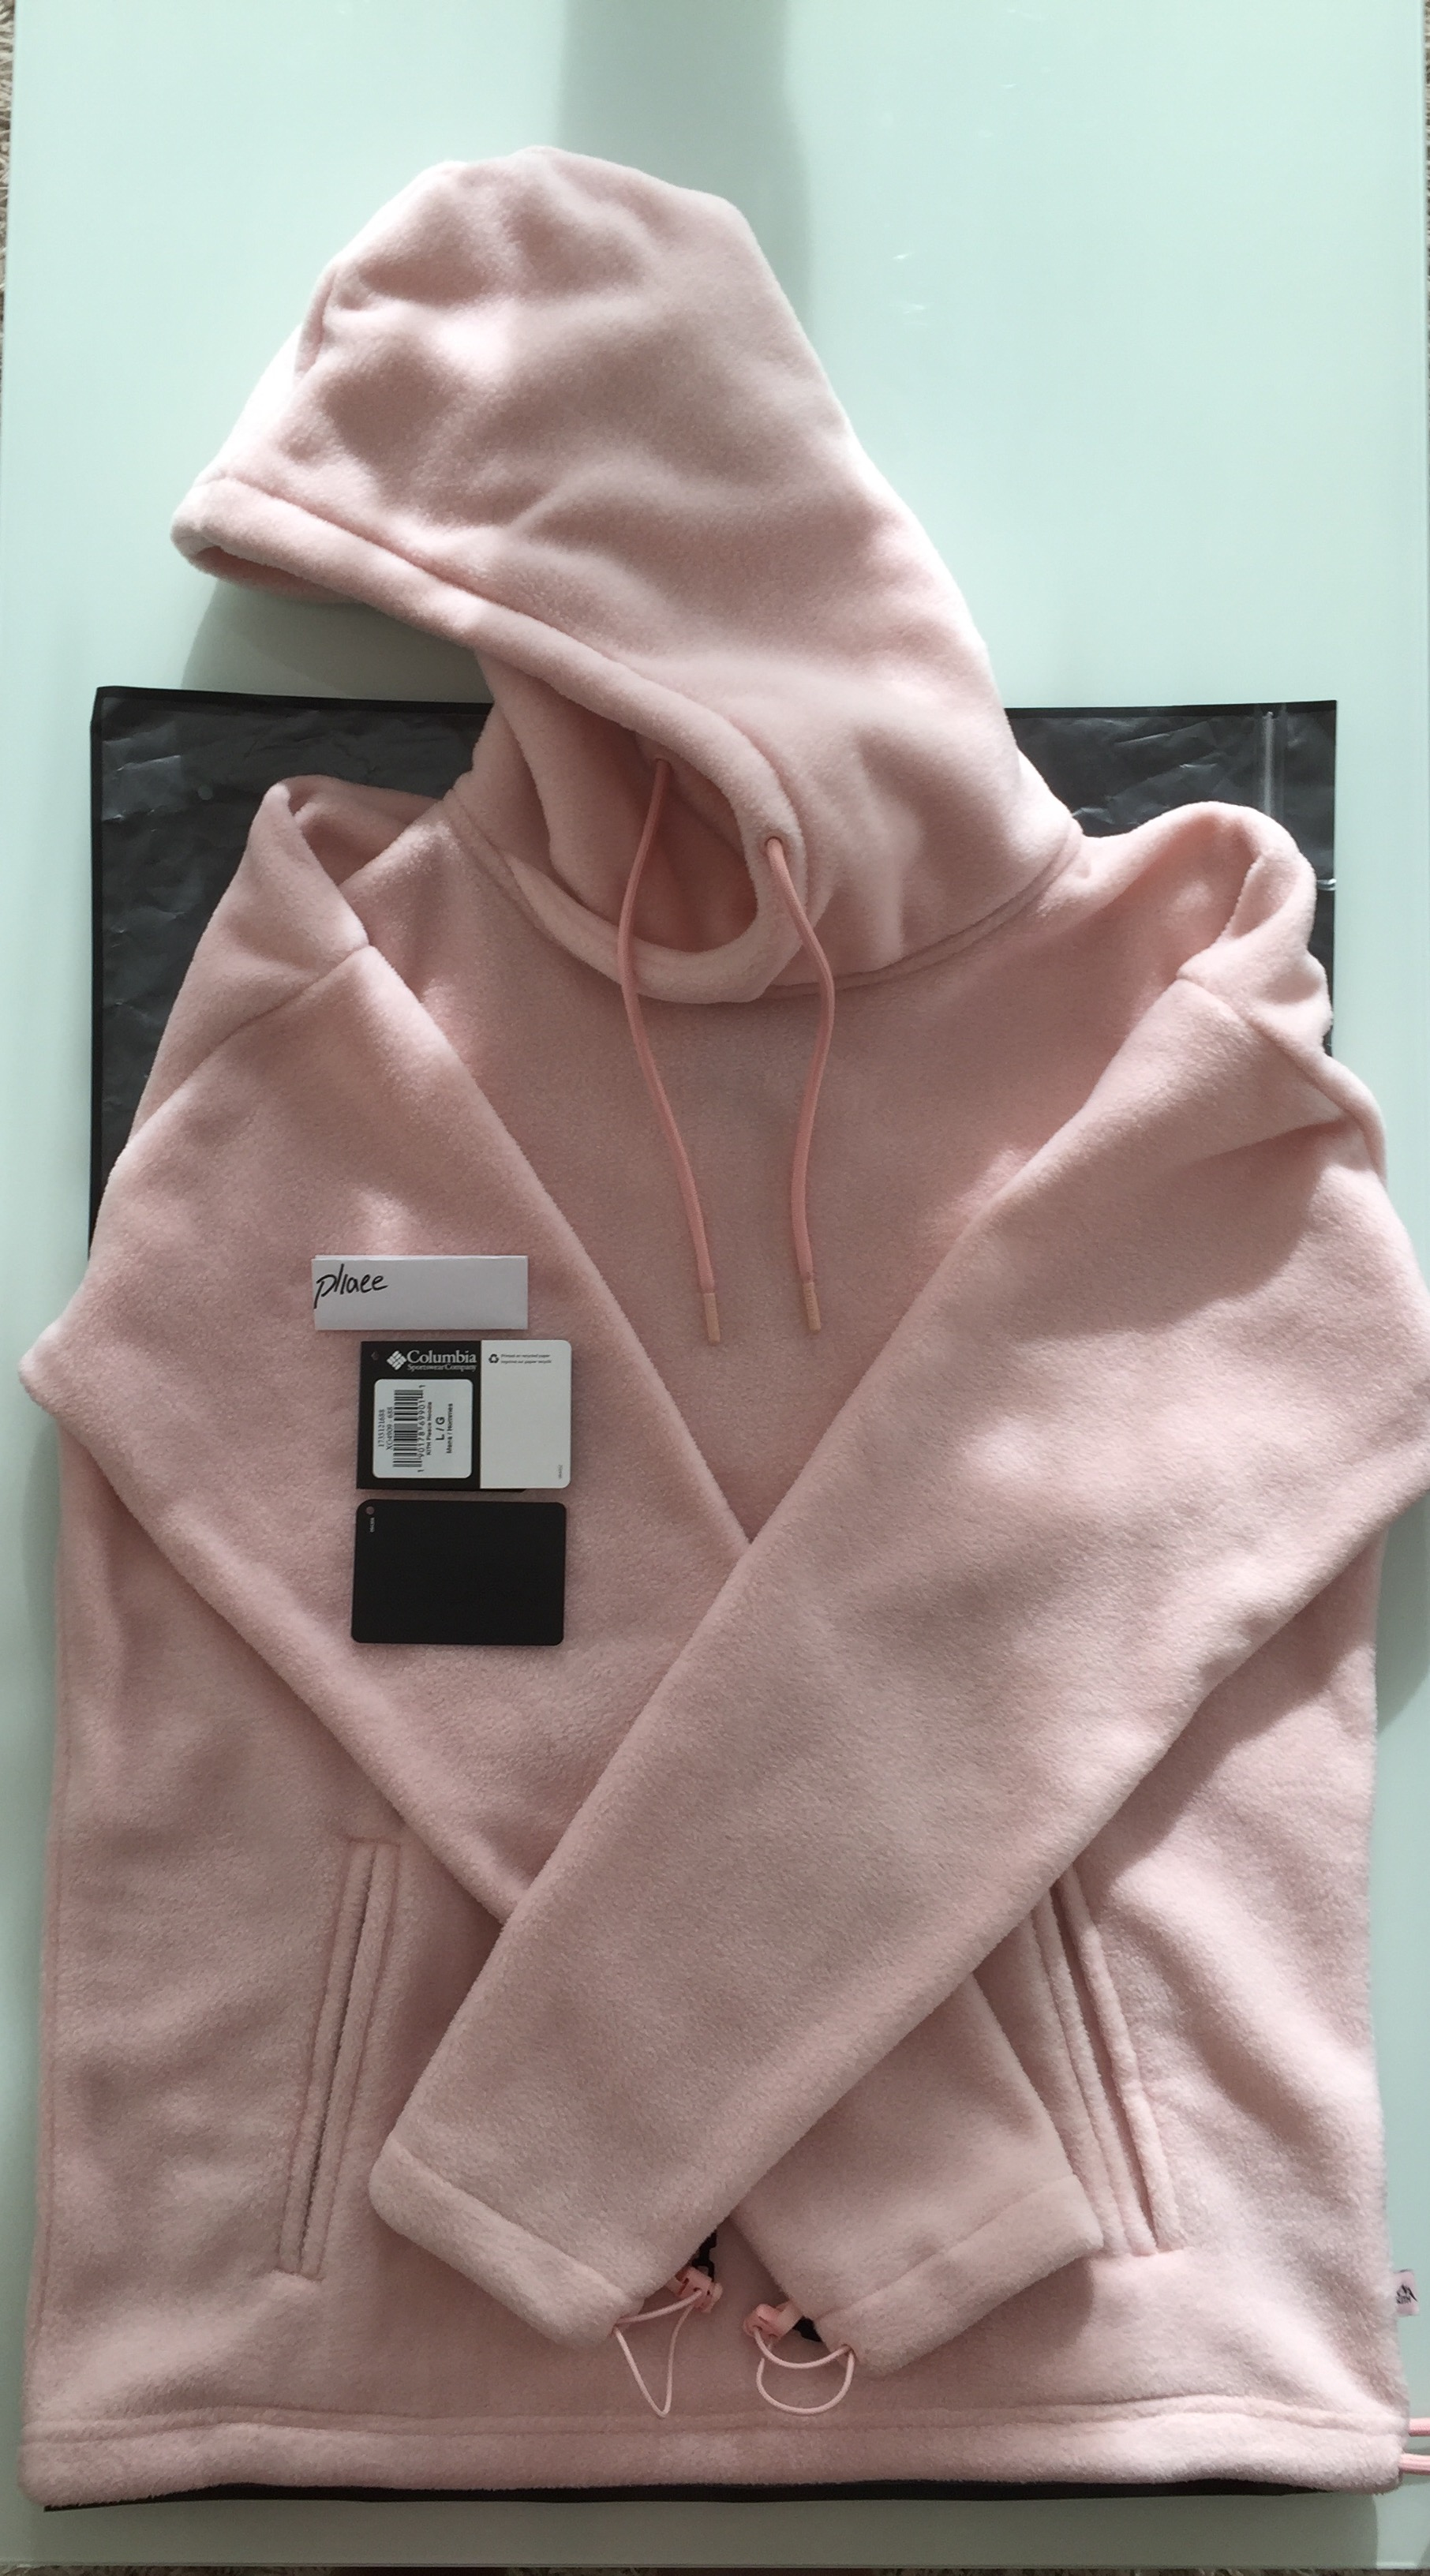 2e59206b Kith Nyc × Columbia ×. Kith Aspen x Columbia Sportswear Core Fleece Hoodie  Vintage Pink. Size: US L / EU 52-54 ...